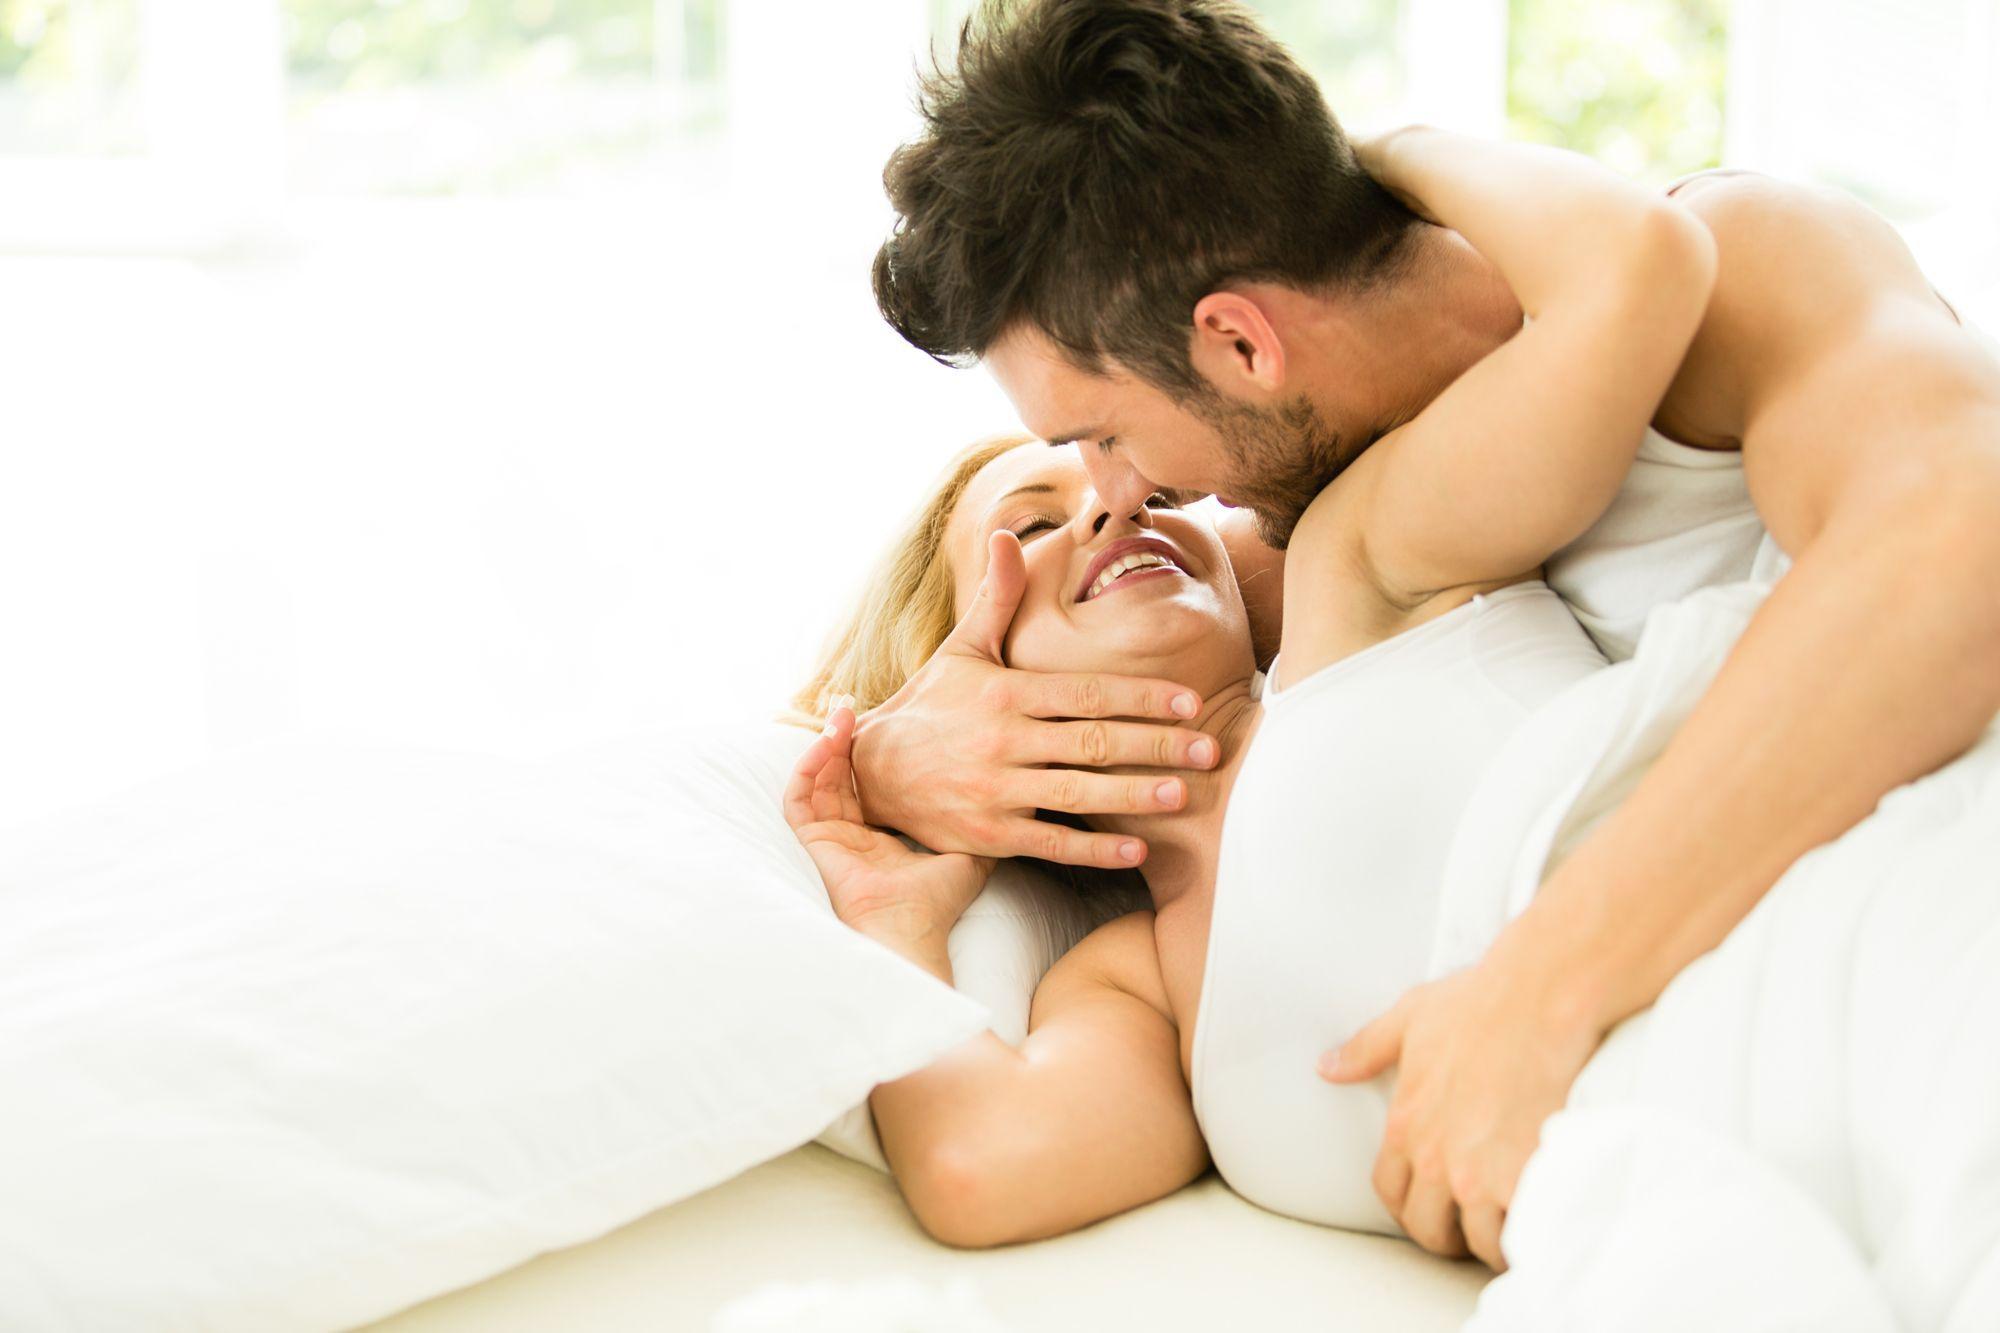 noir mari et femme ayant sexe